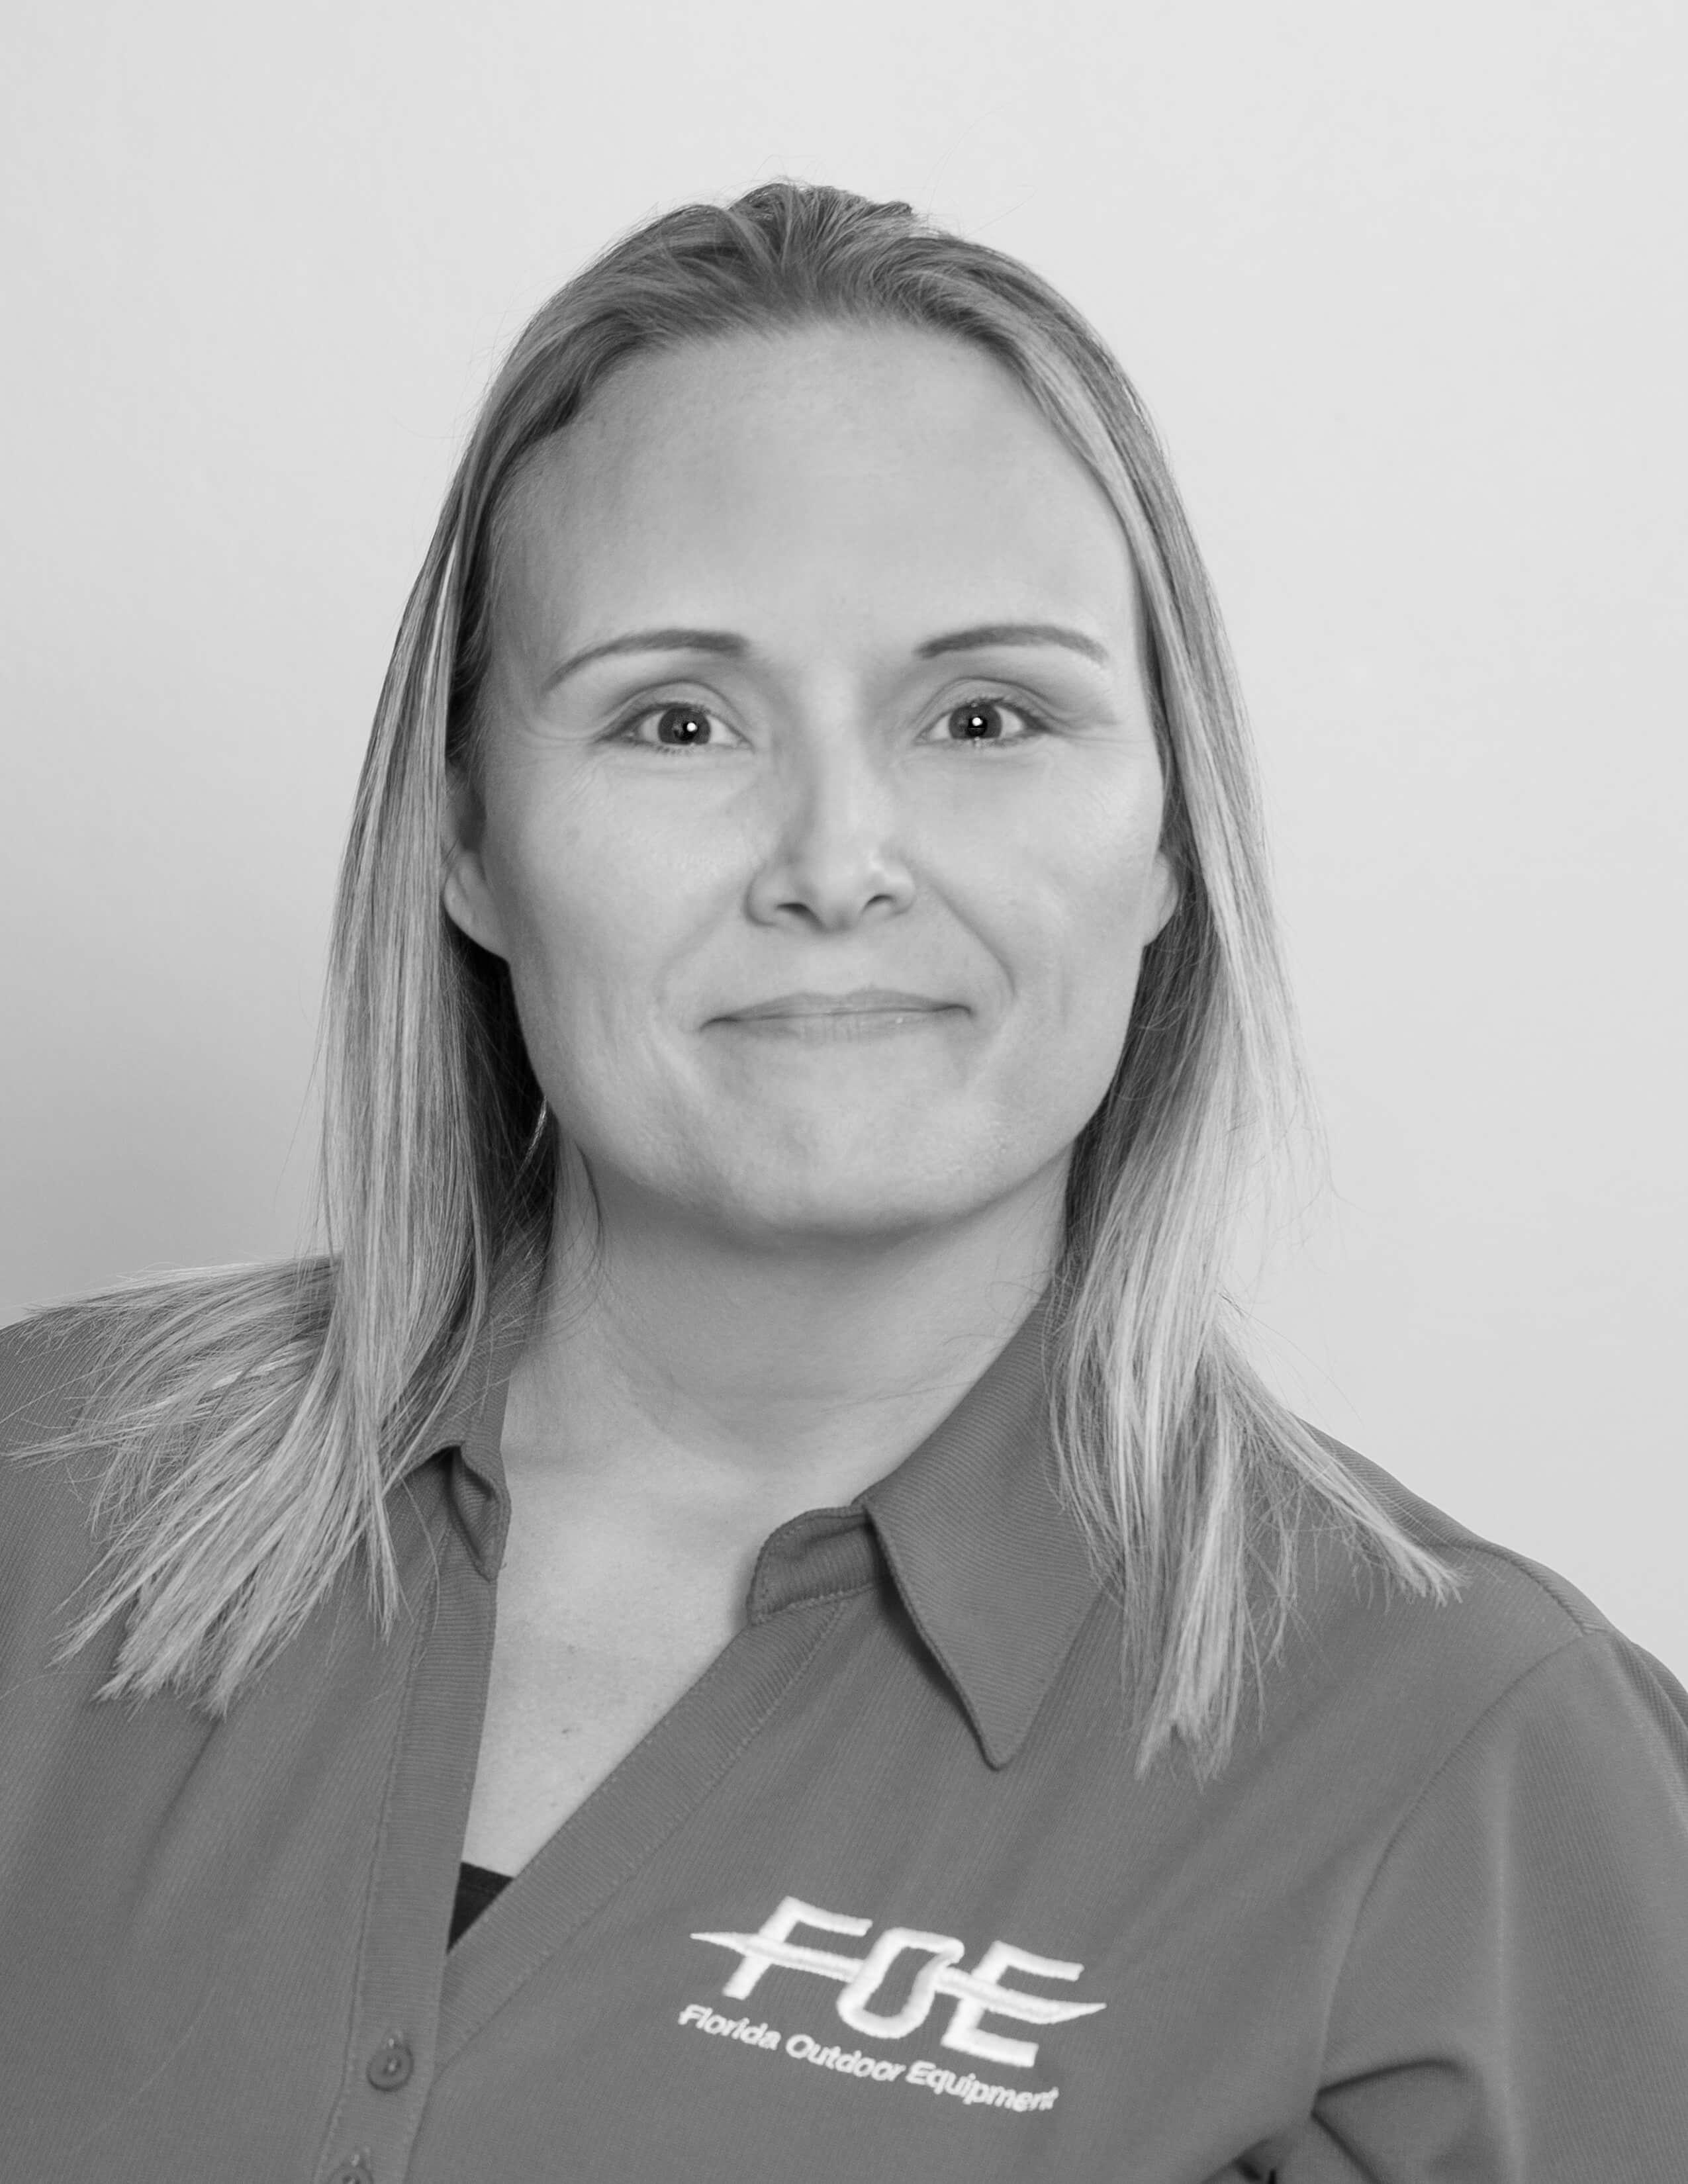 jada profile image